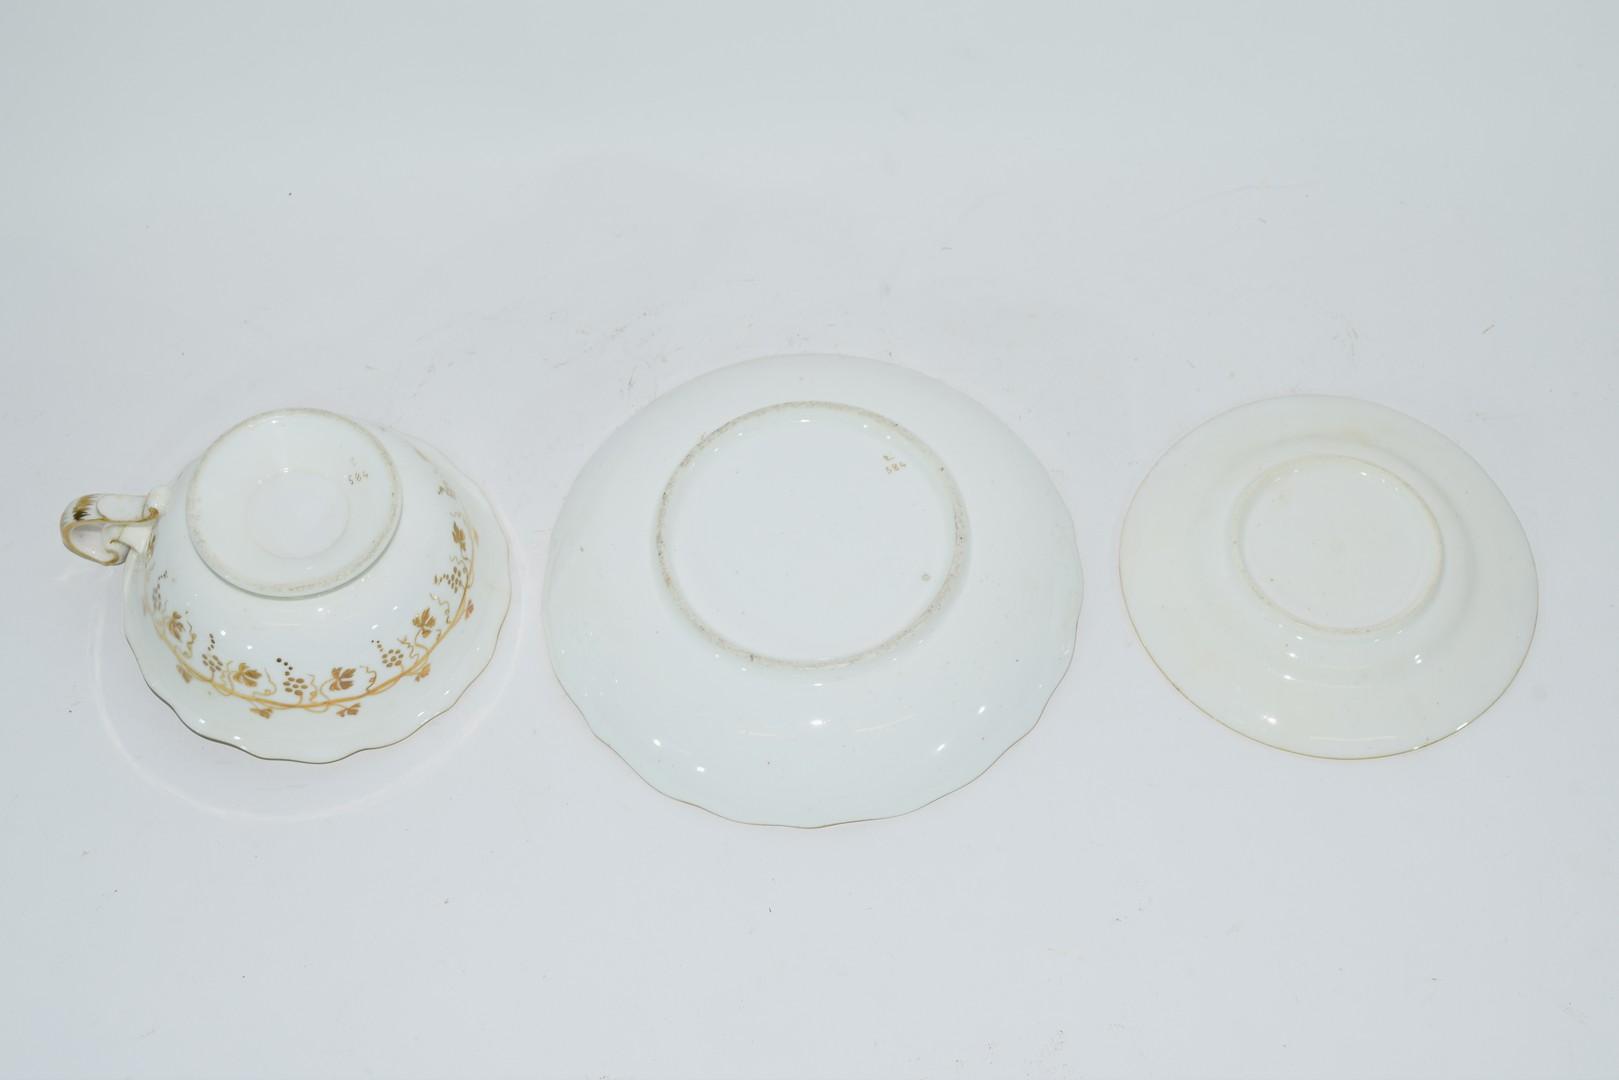 English porcelain trio - Image 3 of 3